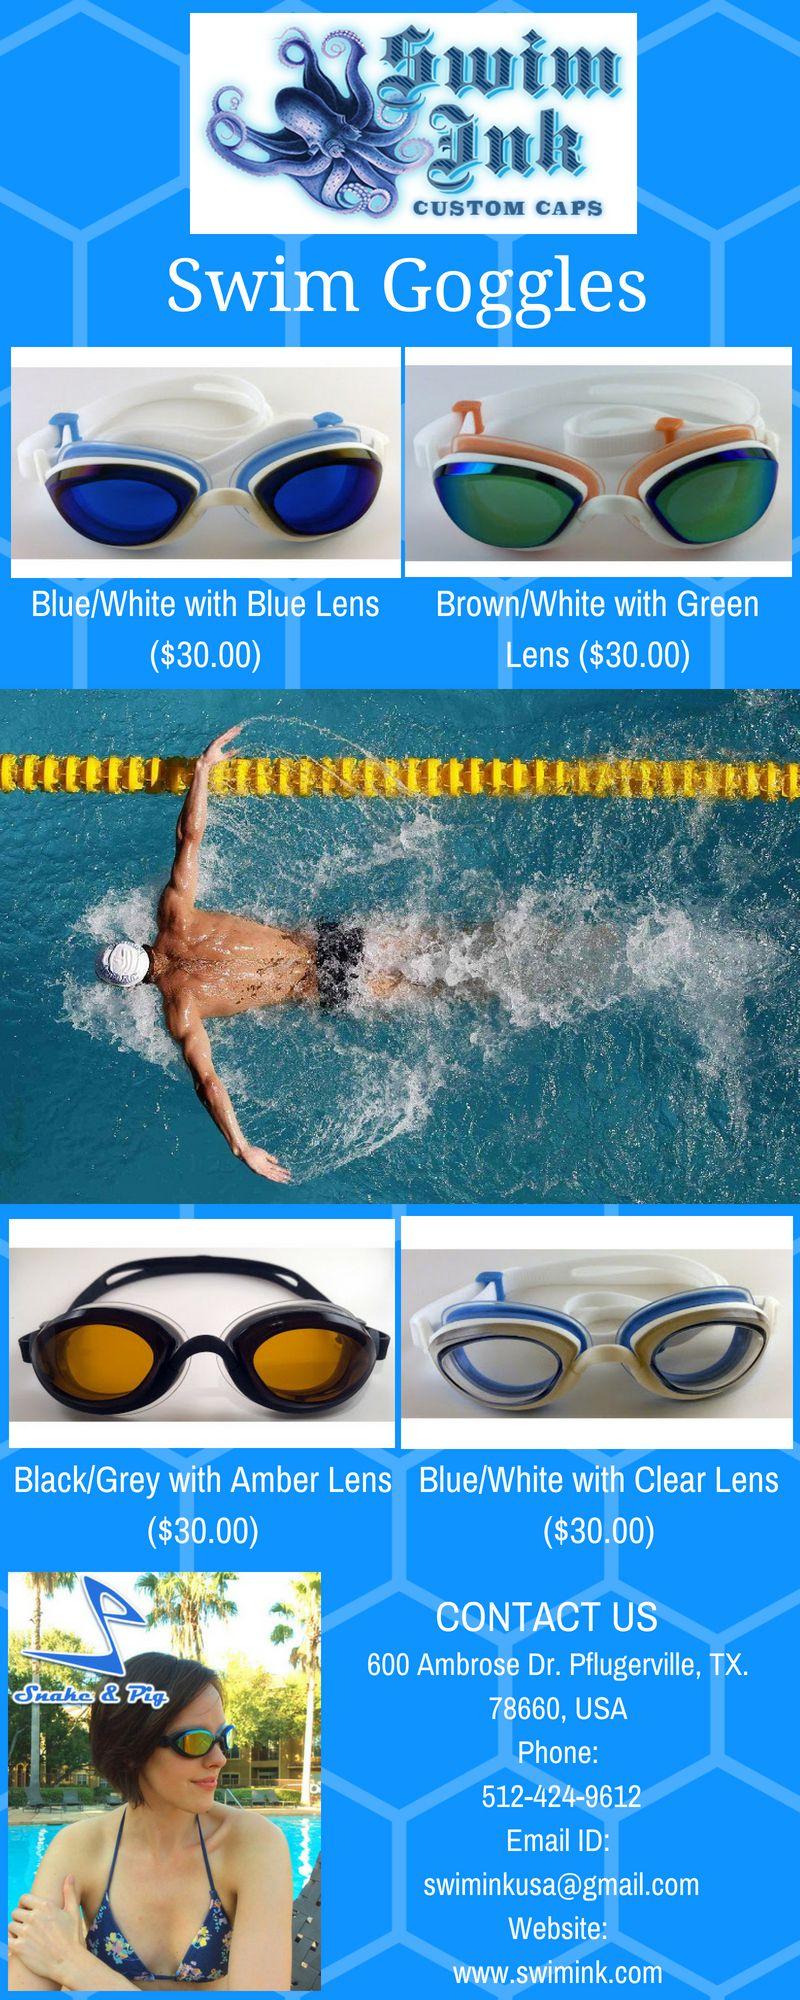 29a268c73fb Comfortable Swim Goggle Email - swiminkusa gmail.com  swimink  Comfortable   Swim Goggle